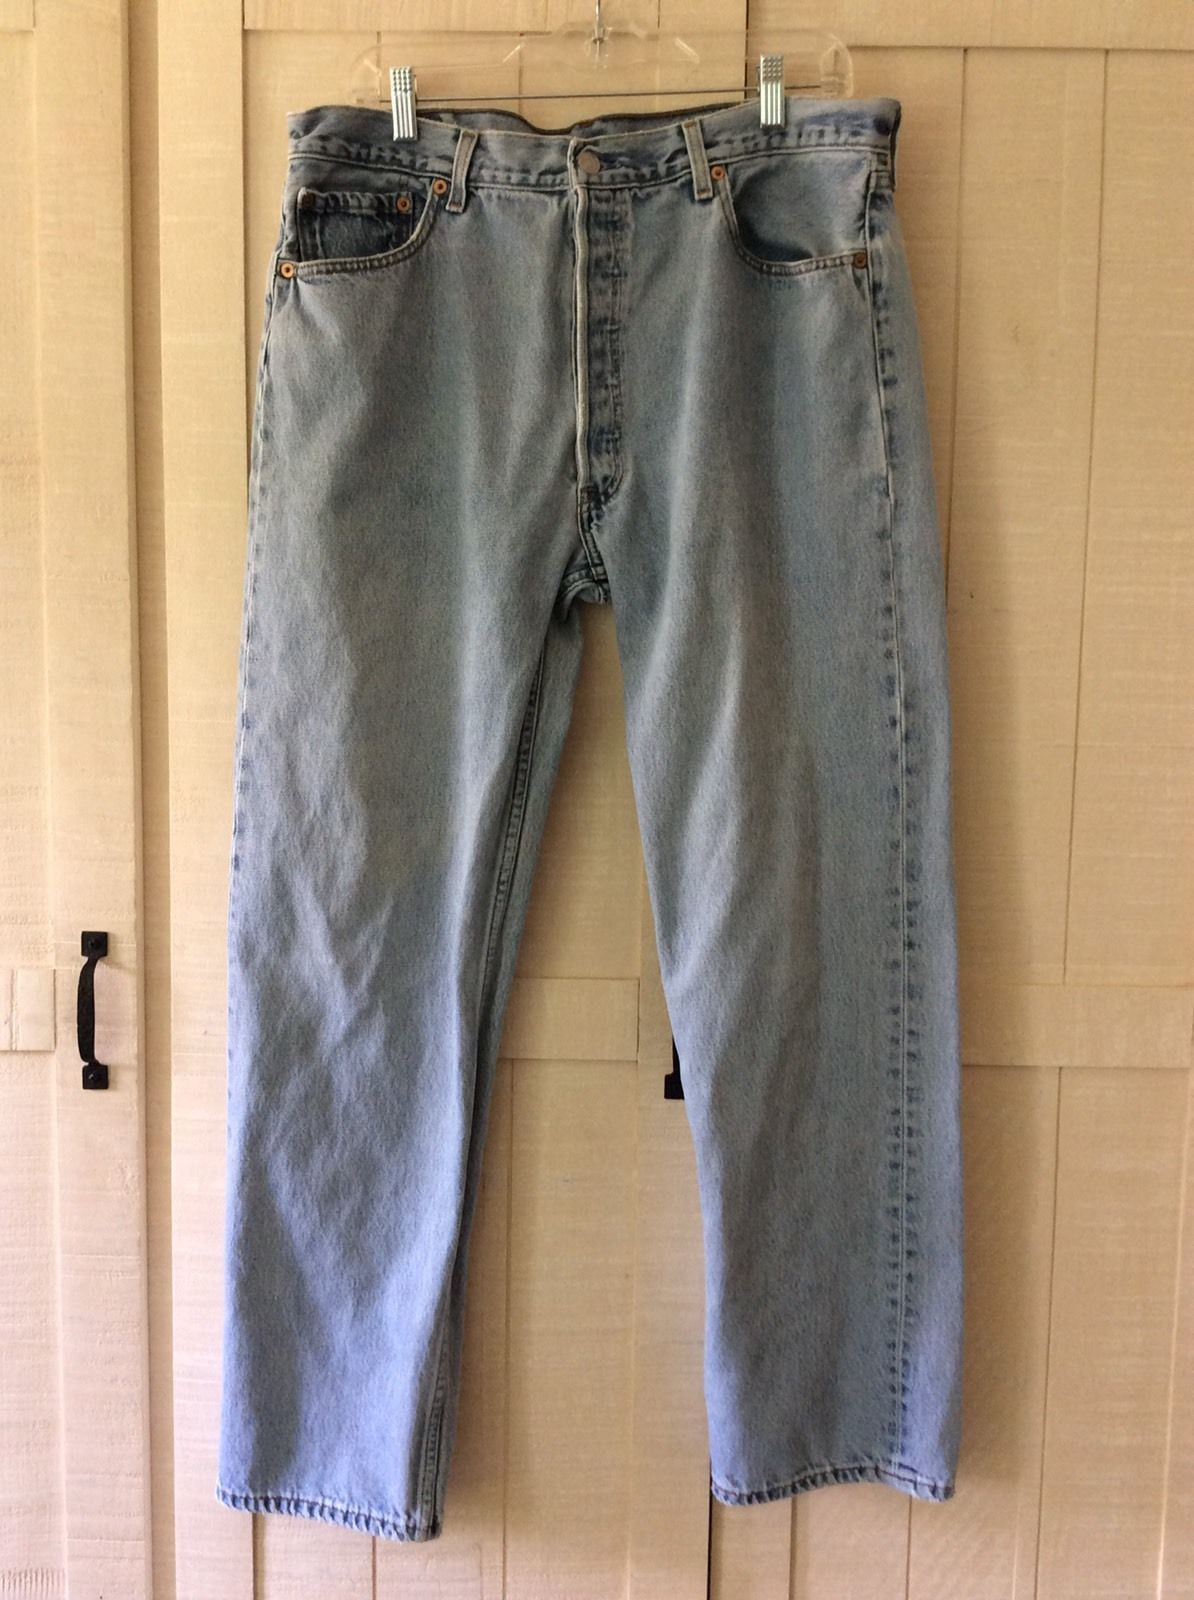 5ed4bb9a Levis 501 Button Fly Jeans 38 X 32 Light Stonewash 5 Pocket Red Tab  Straight Leg | eBay